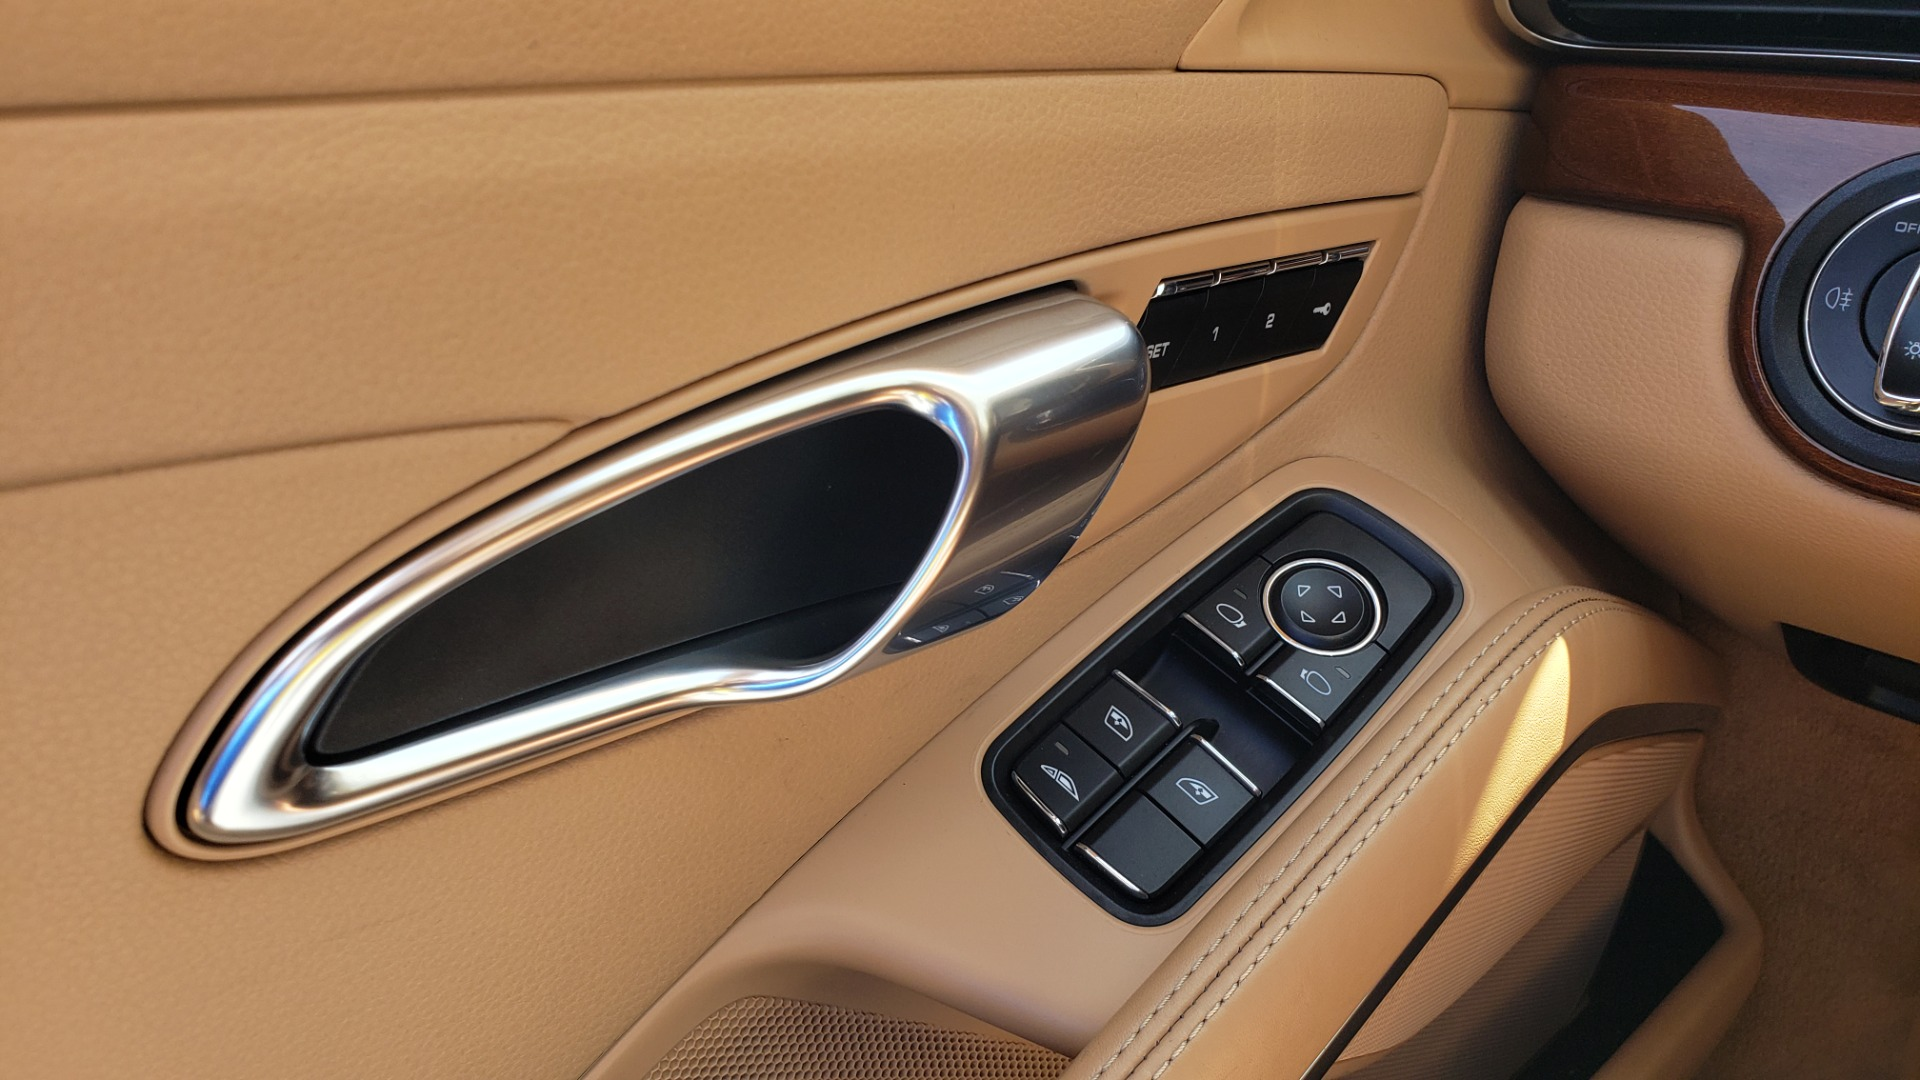 Used 2014 Porsche 911 CARRERA S CABRIOLET / PREM PKG / PDK / NAV / BOSE / SPORT CHRONO for sale $81,995 at Formula Imports in Charlotte NC 28227 22